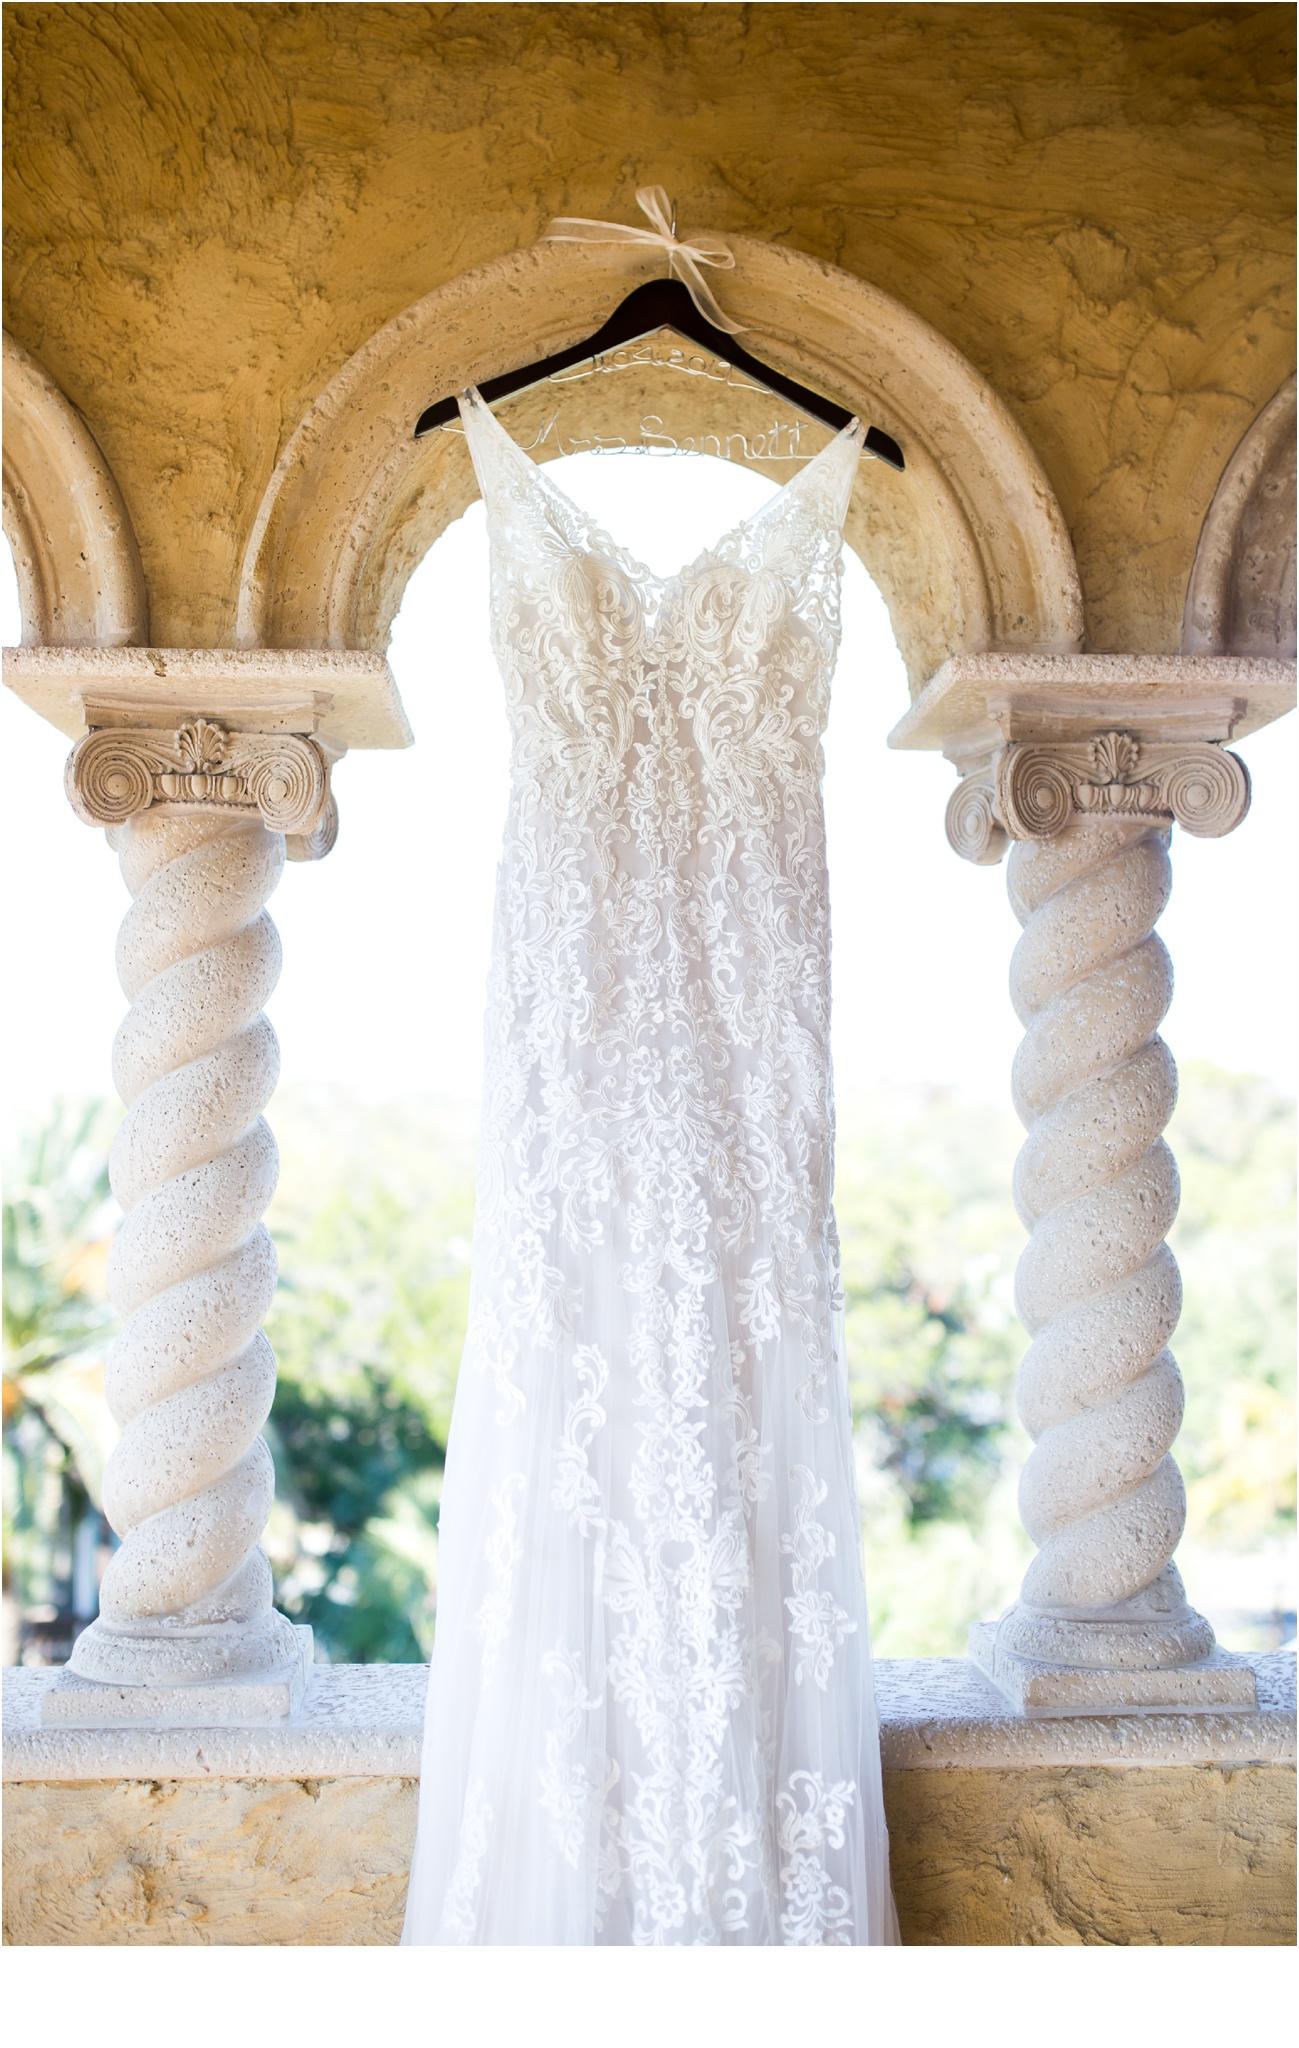 Rainey_Gregg_Photography_St._Simons_Island_Georgia_California_Wedding_Portrait_Photography_0629.jpg